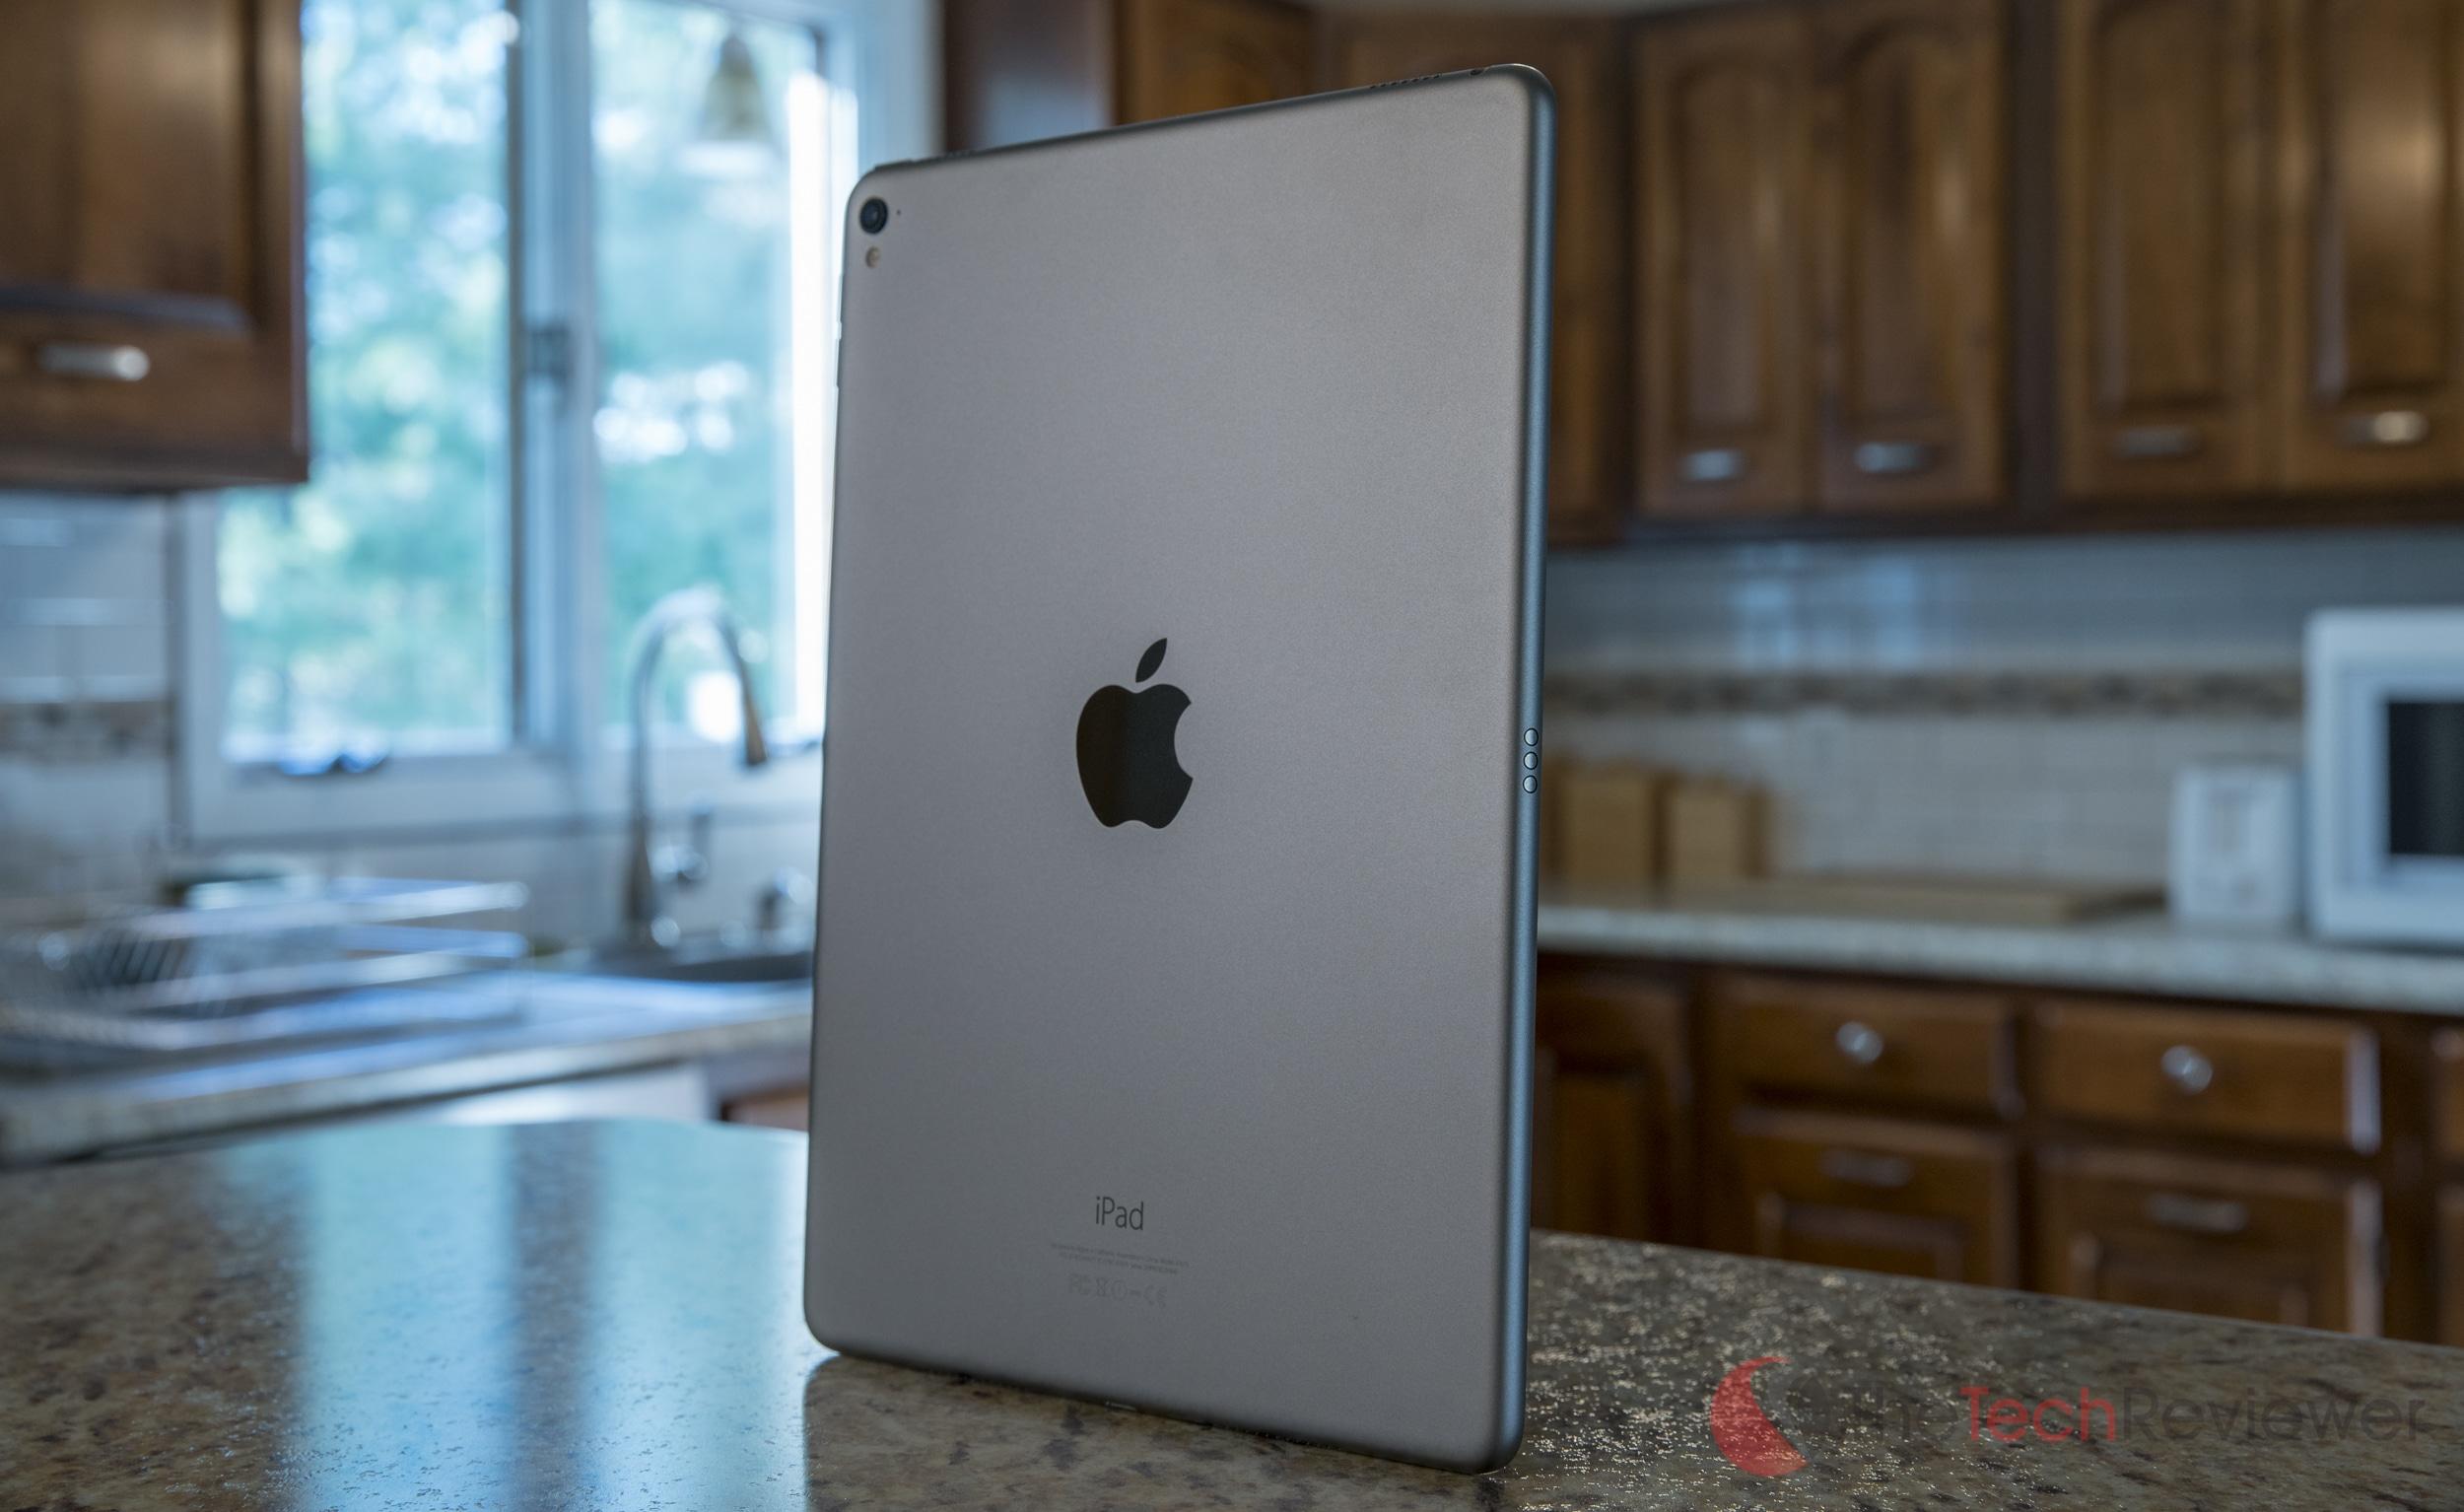 Apple%20iPad%20Pro%209.7-inch-8